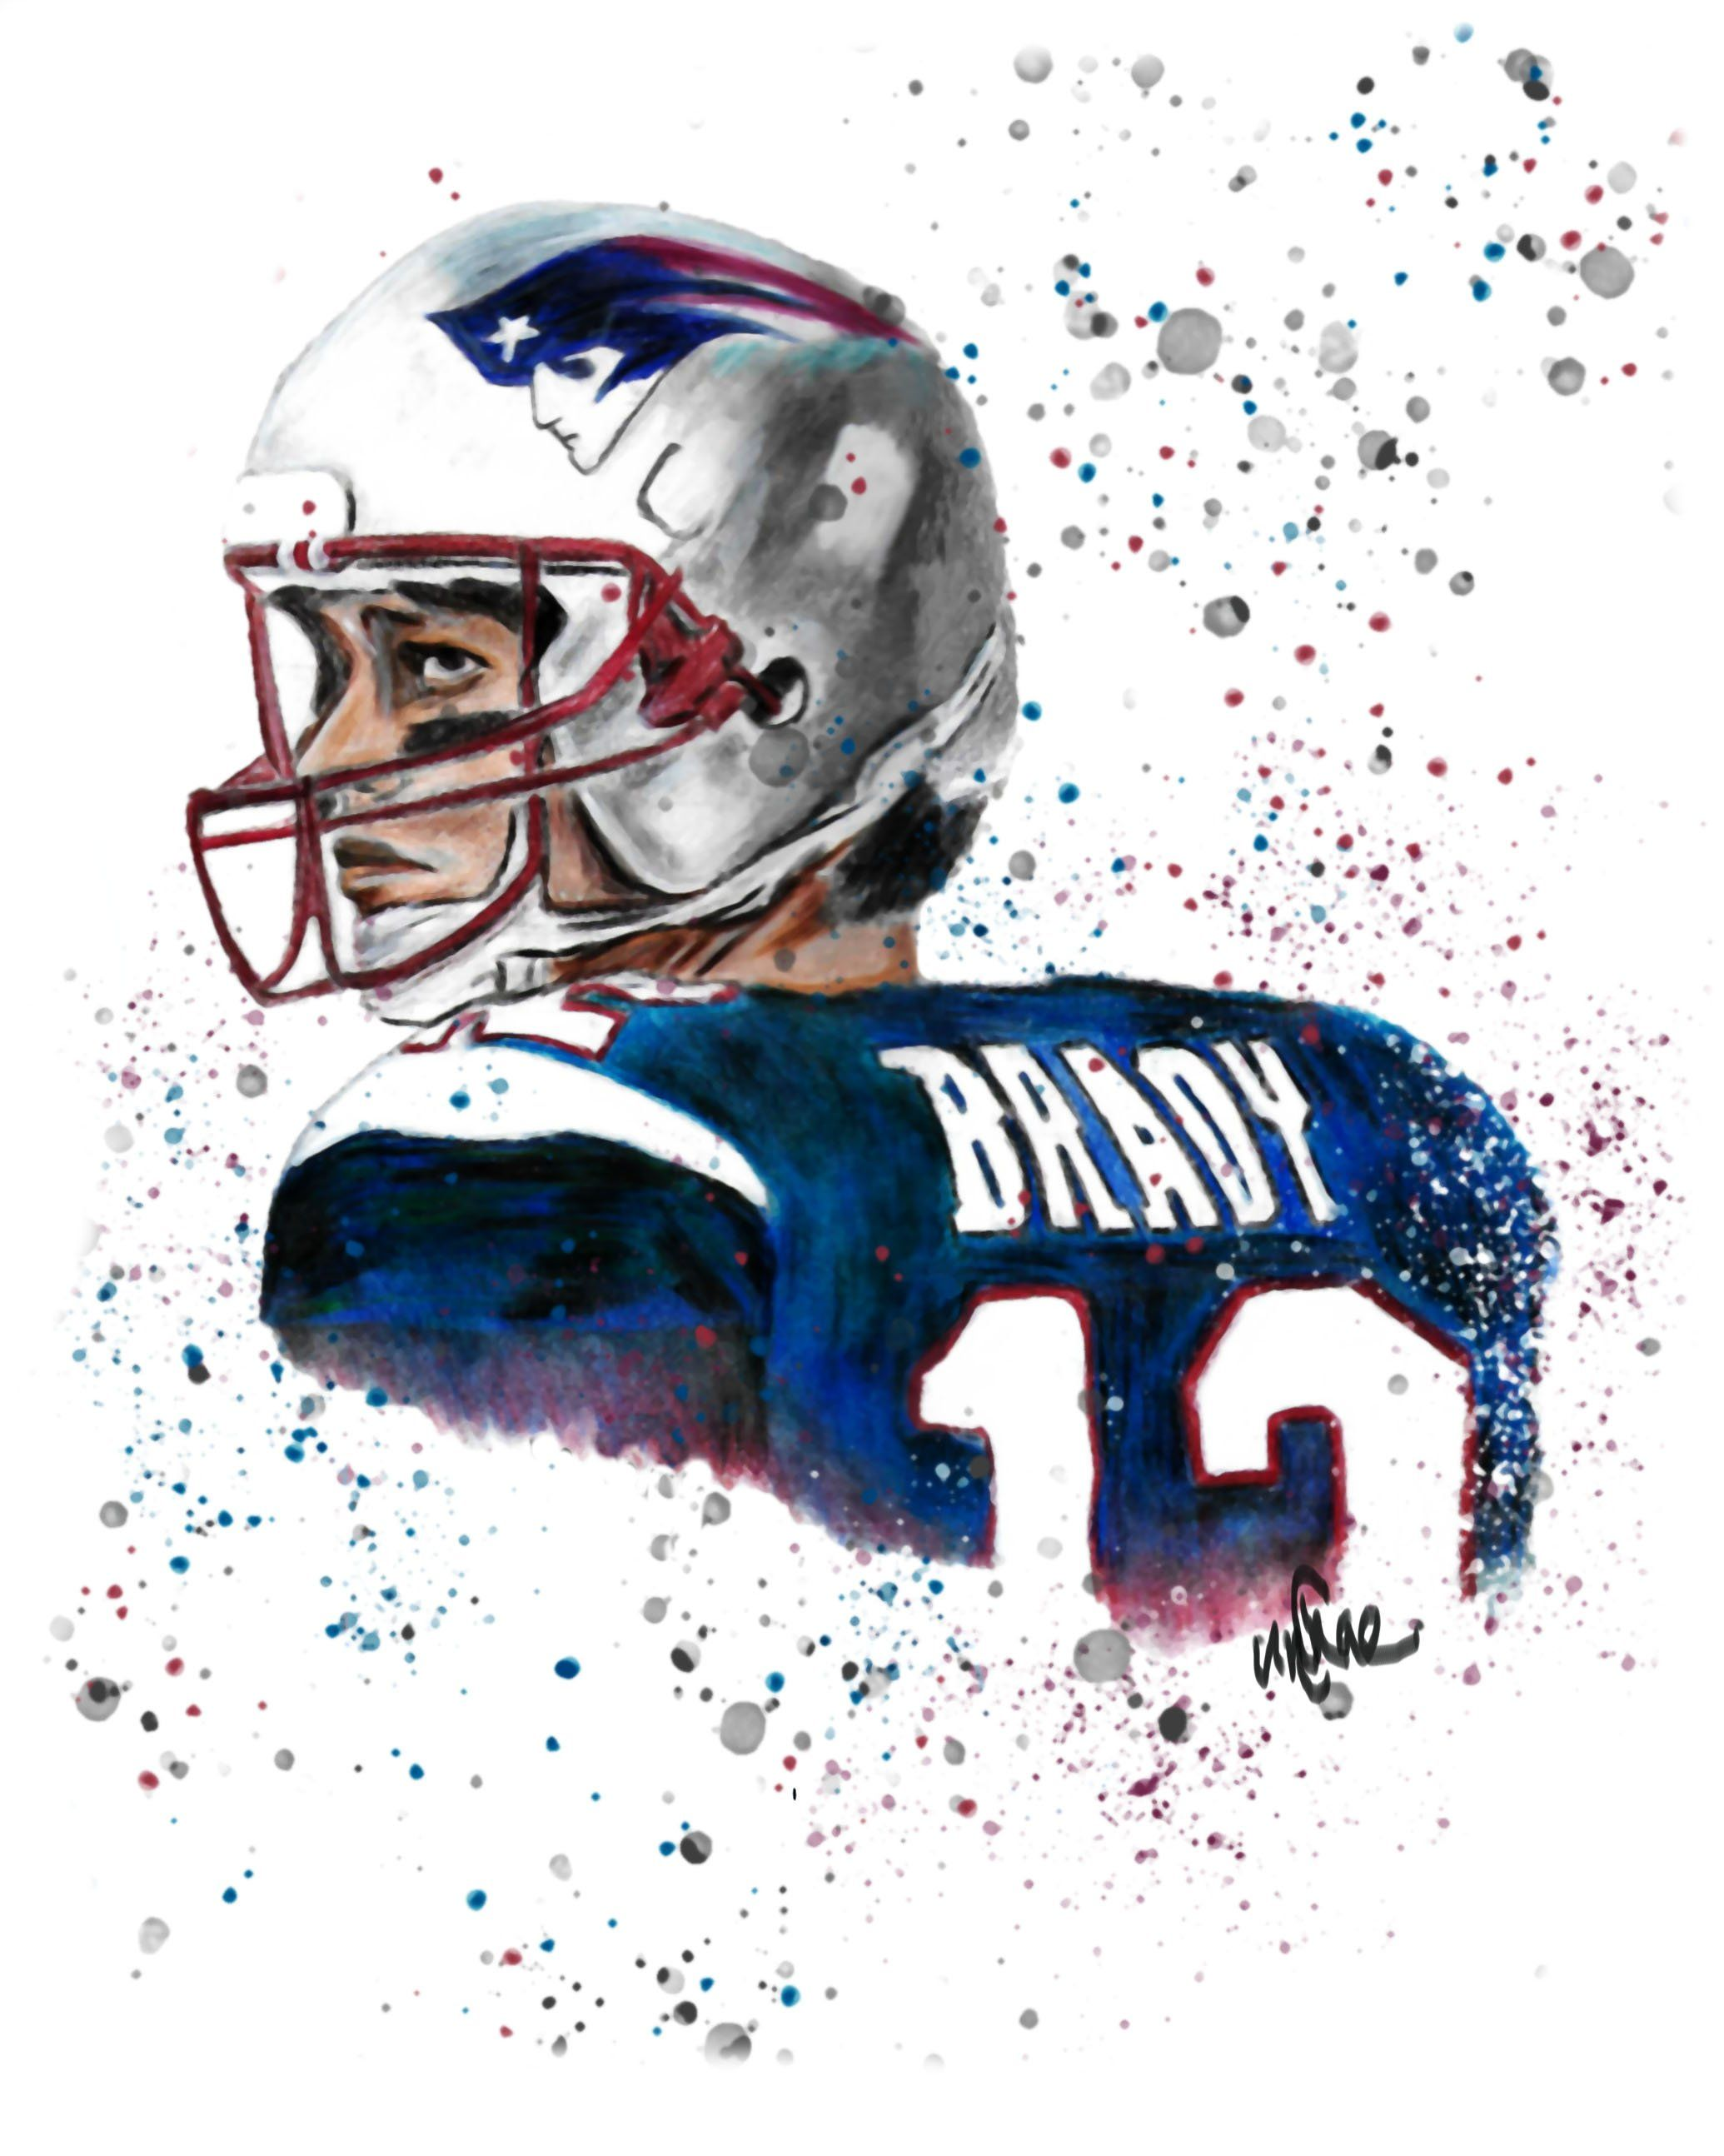 Tom Brady Patriots Art Print Football Quarterback Nfl Drawing Coloring Pencil Digital Goat Superb Tom Brady Patriots Superbowl Mvp Football